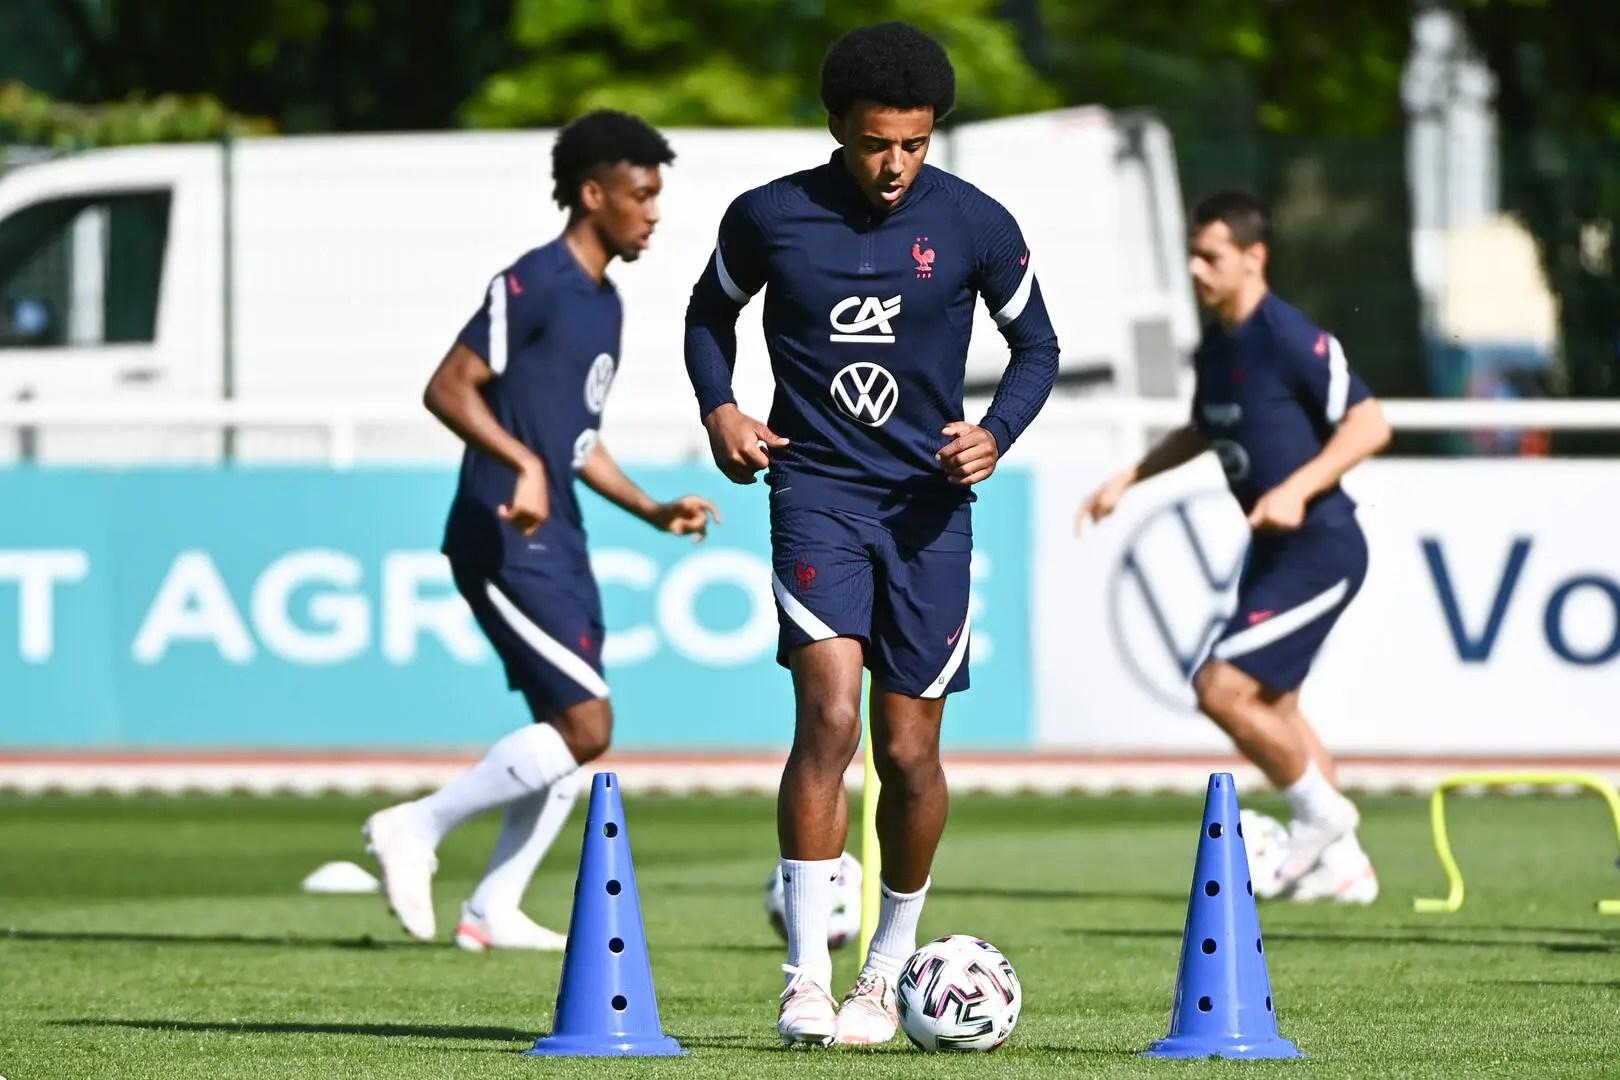 Sevilla tolak tawaran chelsea untuk transfer jules kounde. Maillot Kounde France - img-Bachue